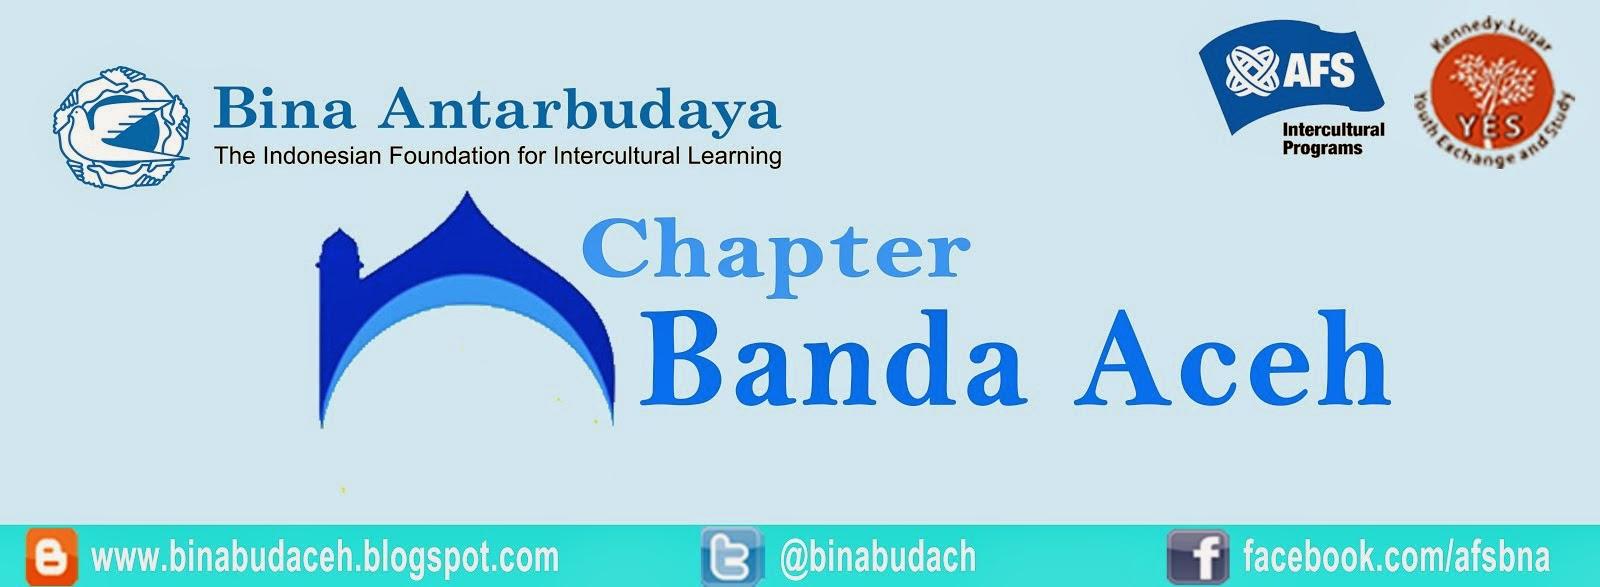 Bina Antarbudaya Chapter Banda Aceh